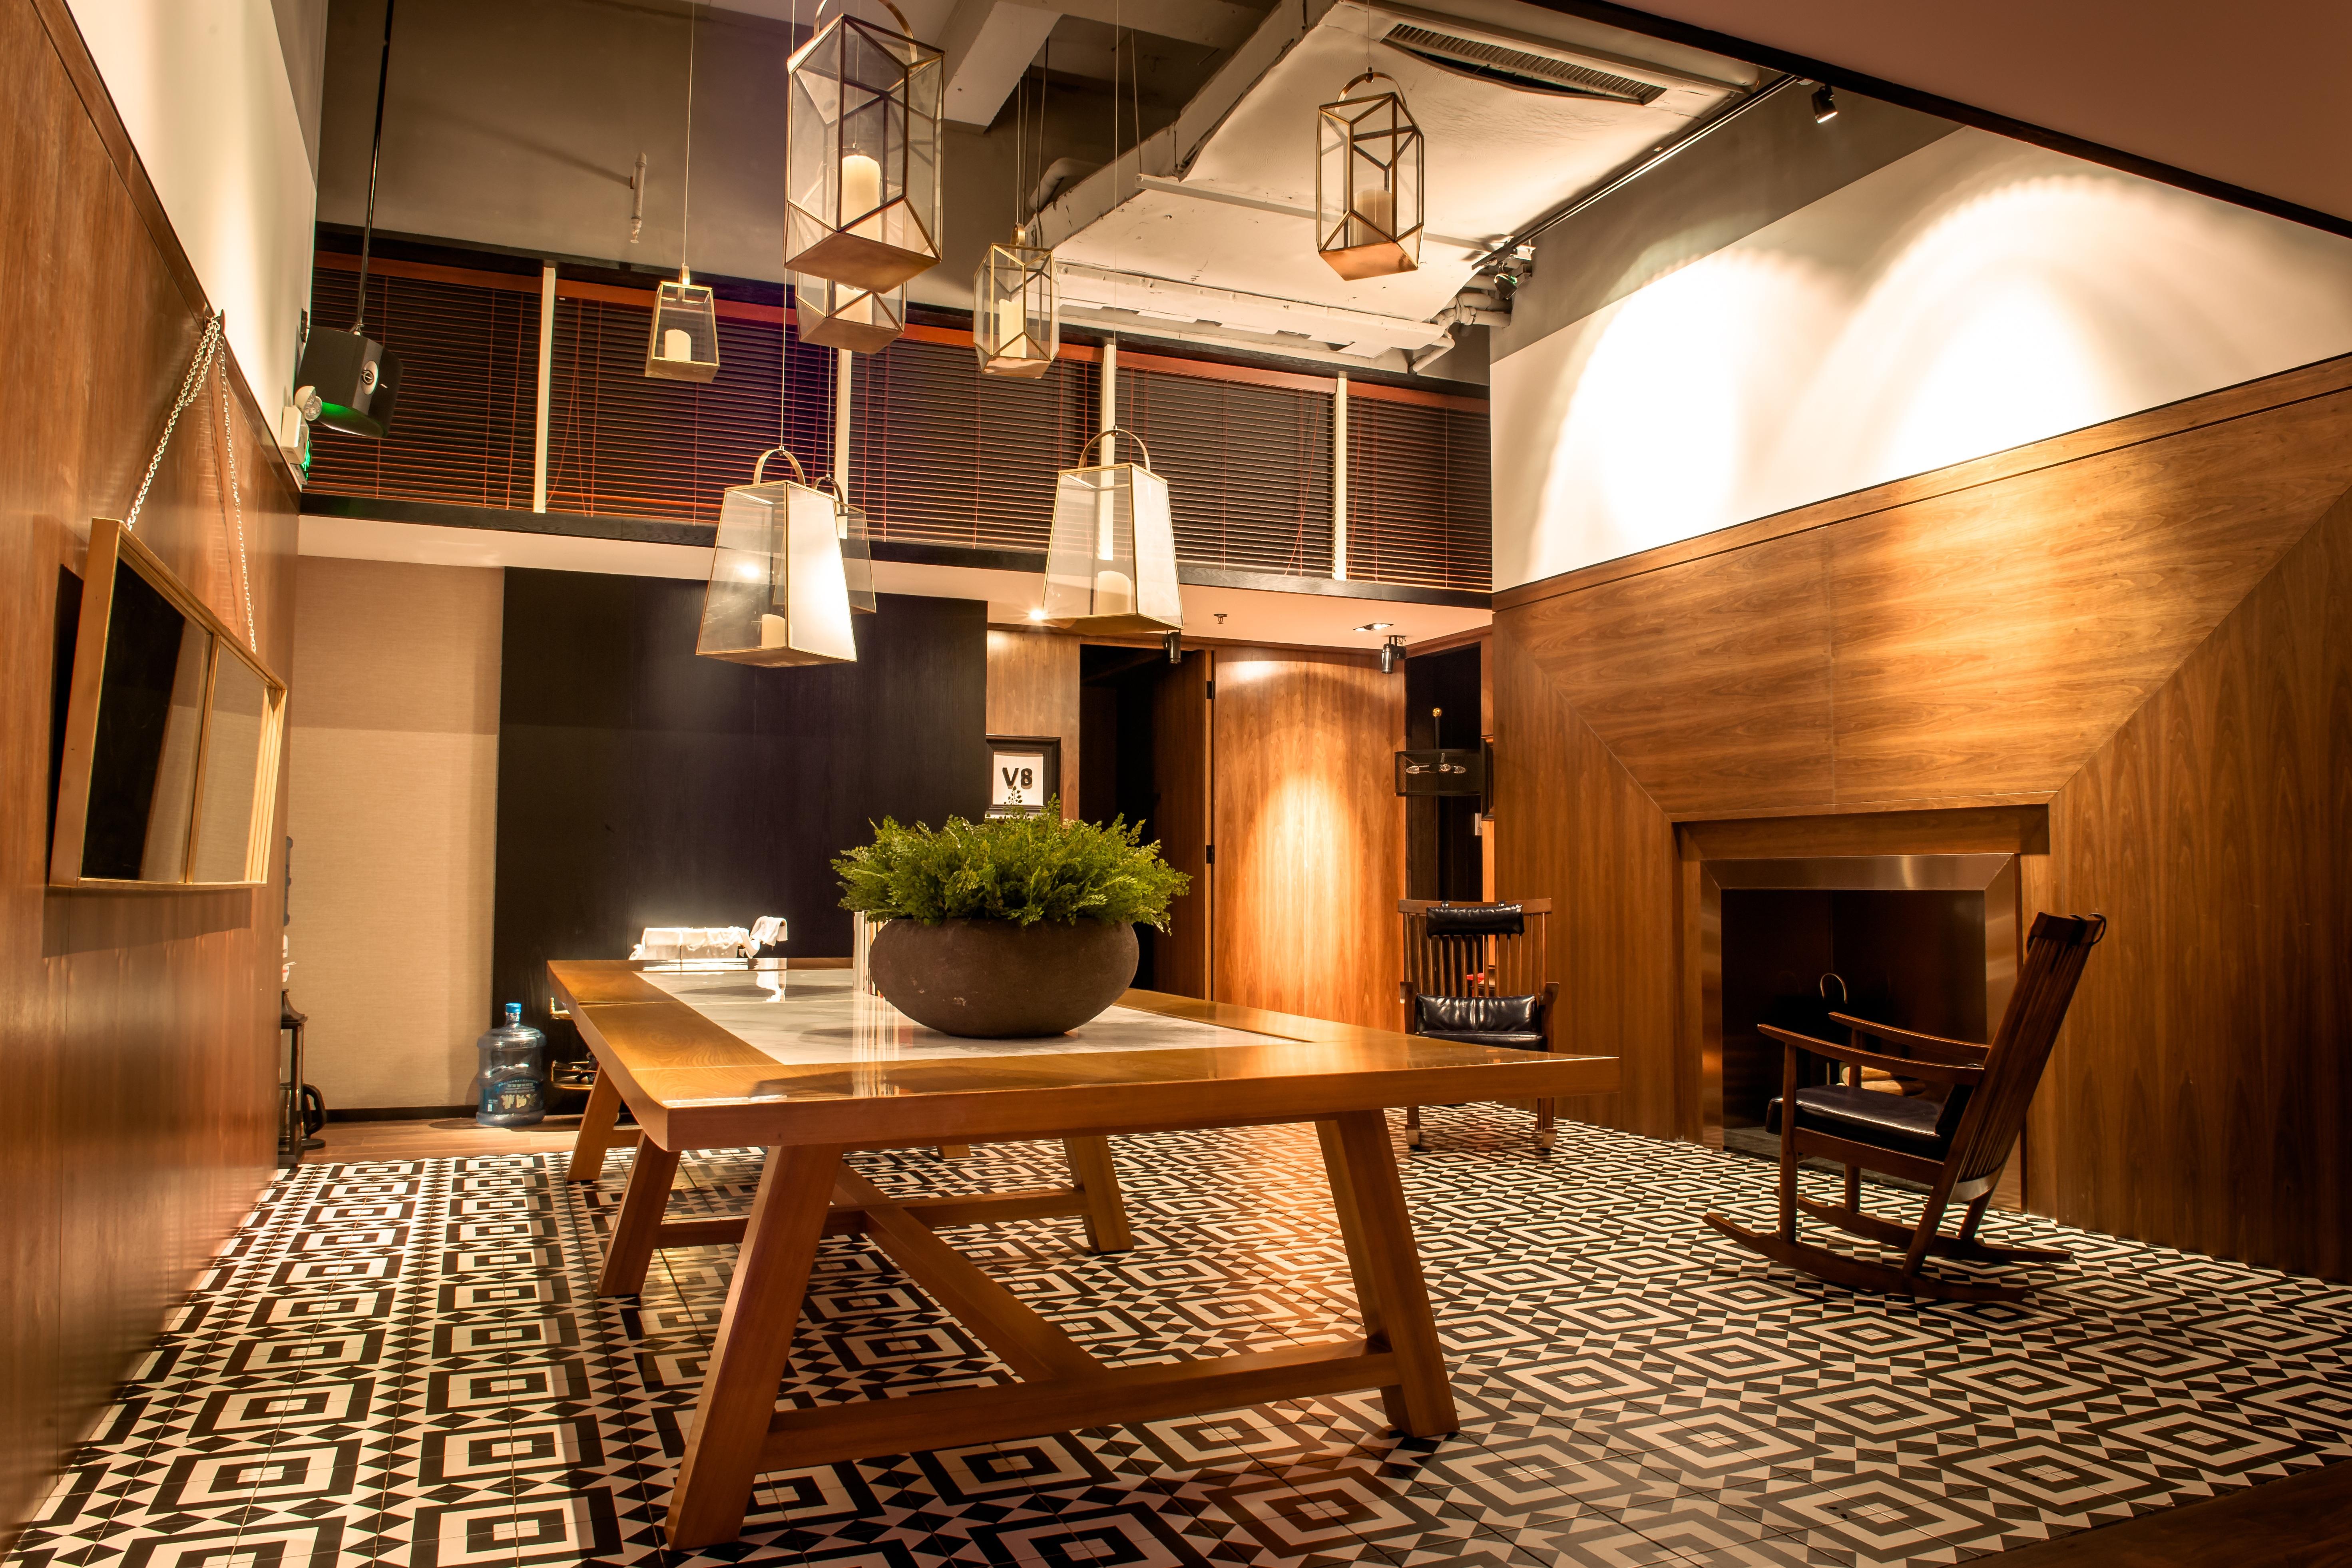 Gratis billeder : etage, restaurant, hjem, bar, loft, sommerhus ...